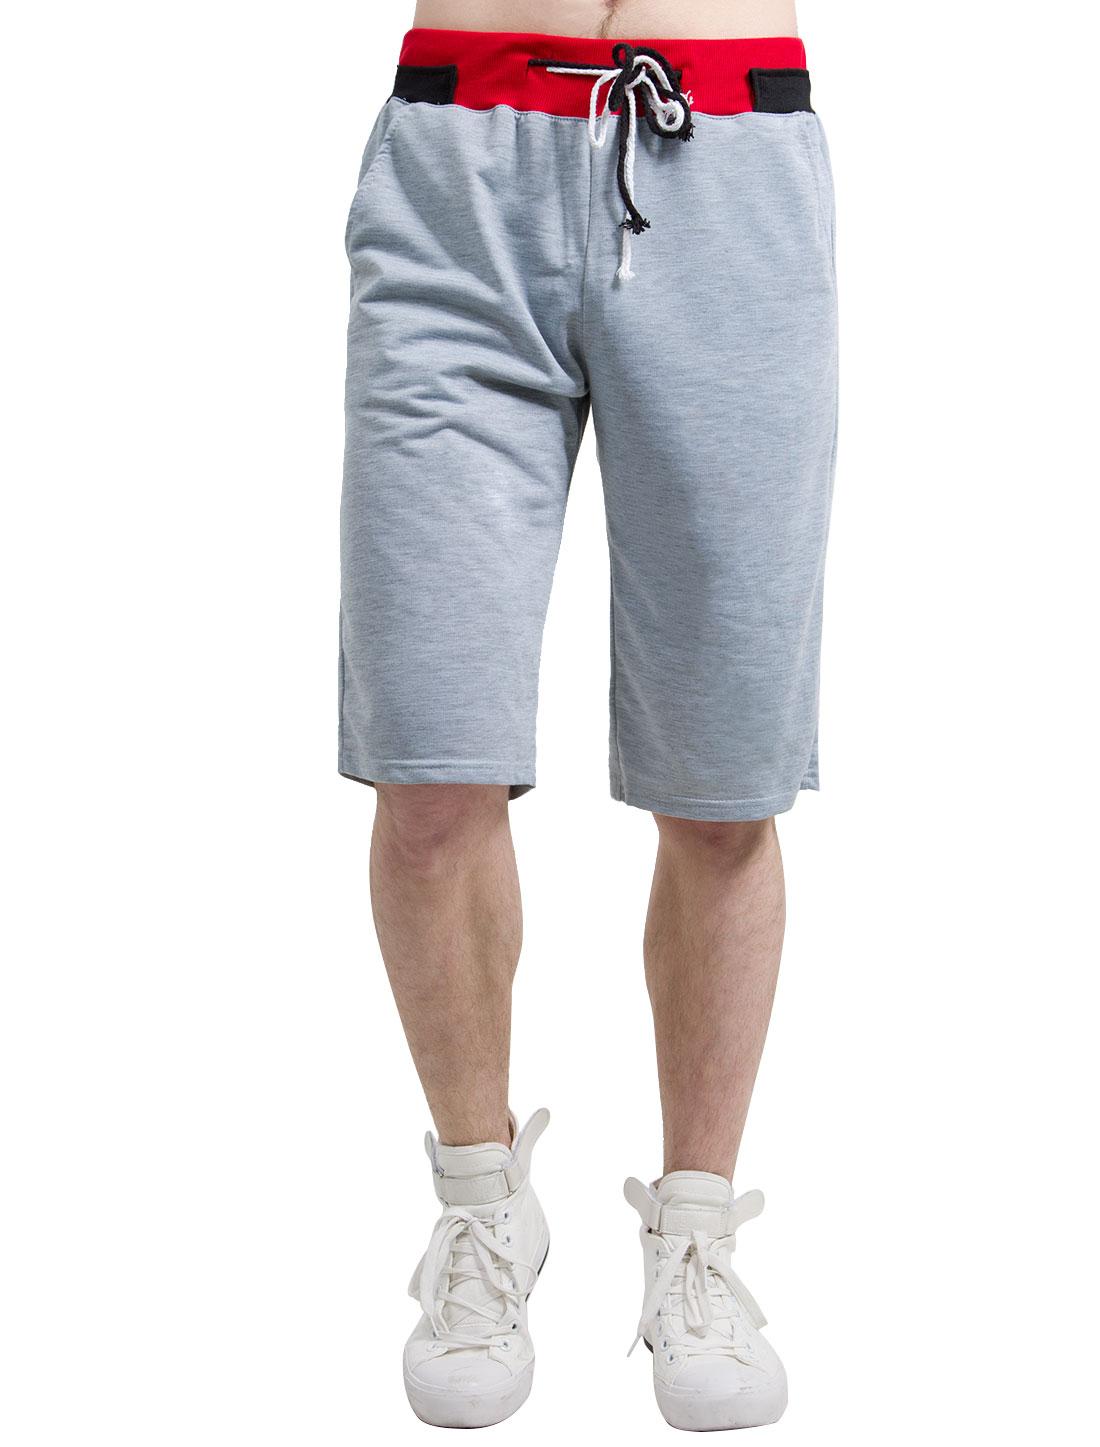 Men Color Block Drawstring Elastic Waistband Boardshorts Shorts Light Grey XS